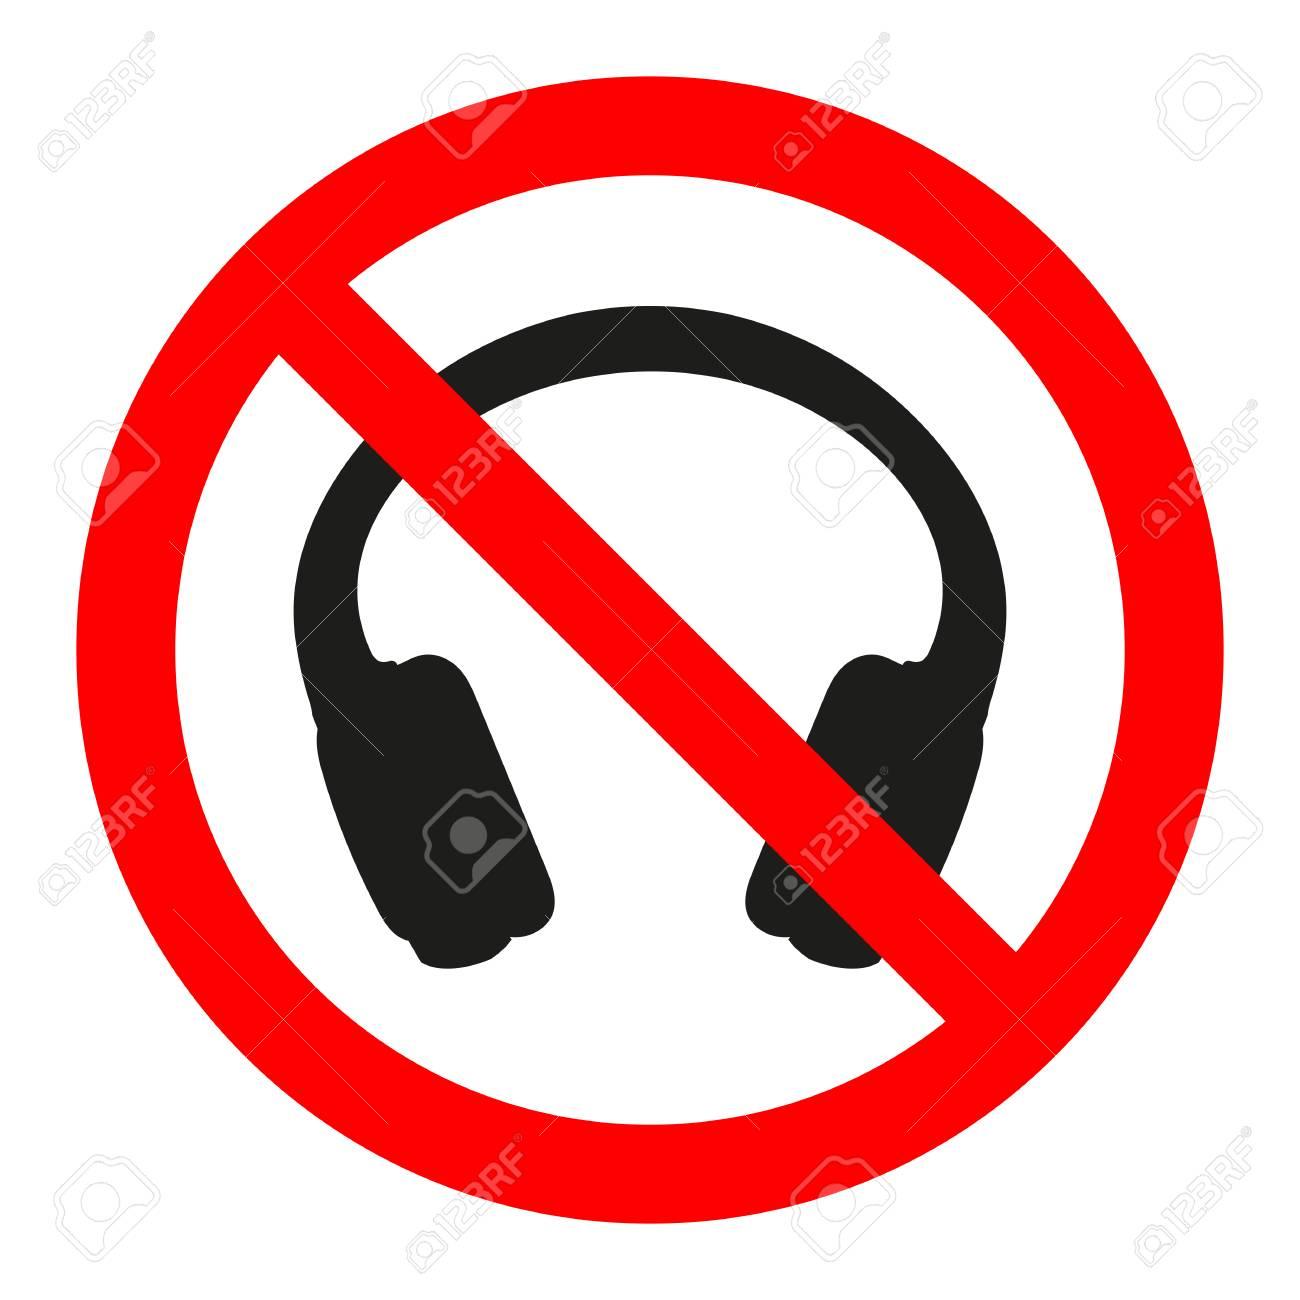 sign prohibited headphones on white background - 105255207